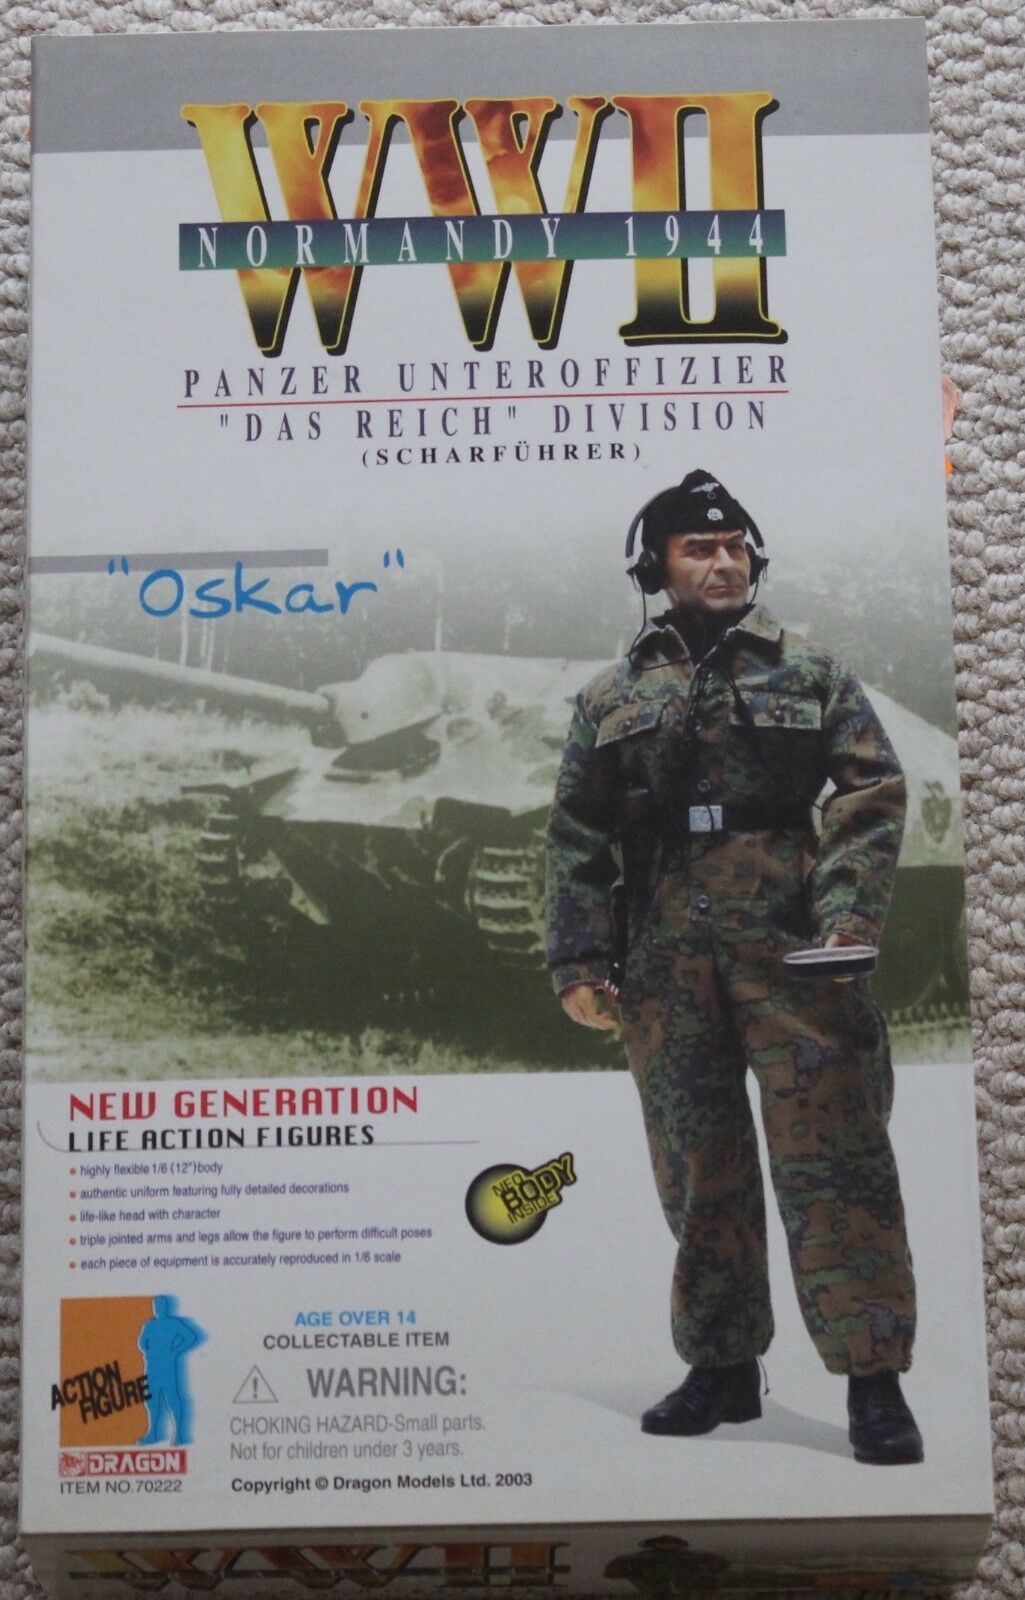 Dragon Action Figure ww11 tedesco Oskar CISTERNA 1/6 12  70222 DID Cyber HOT Toy